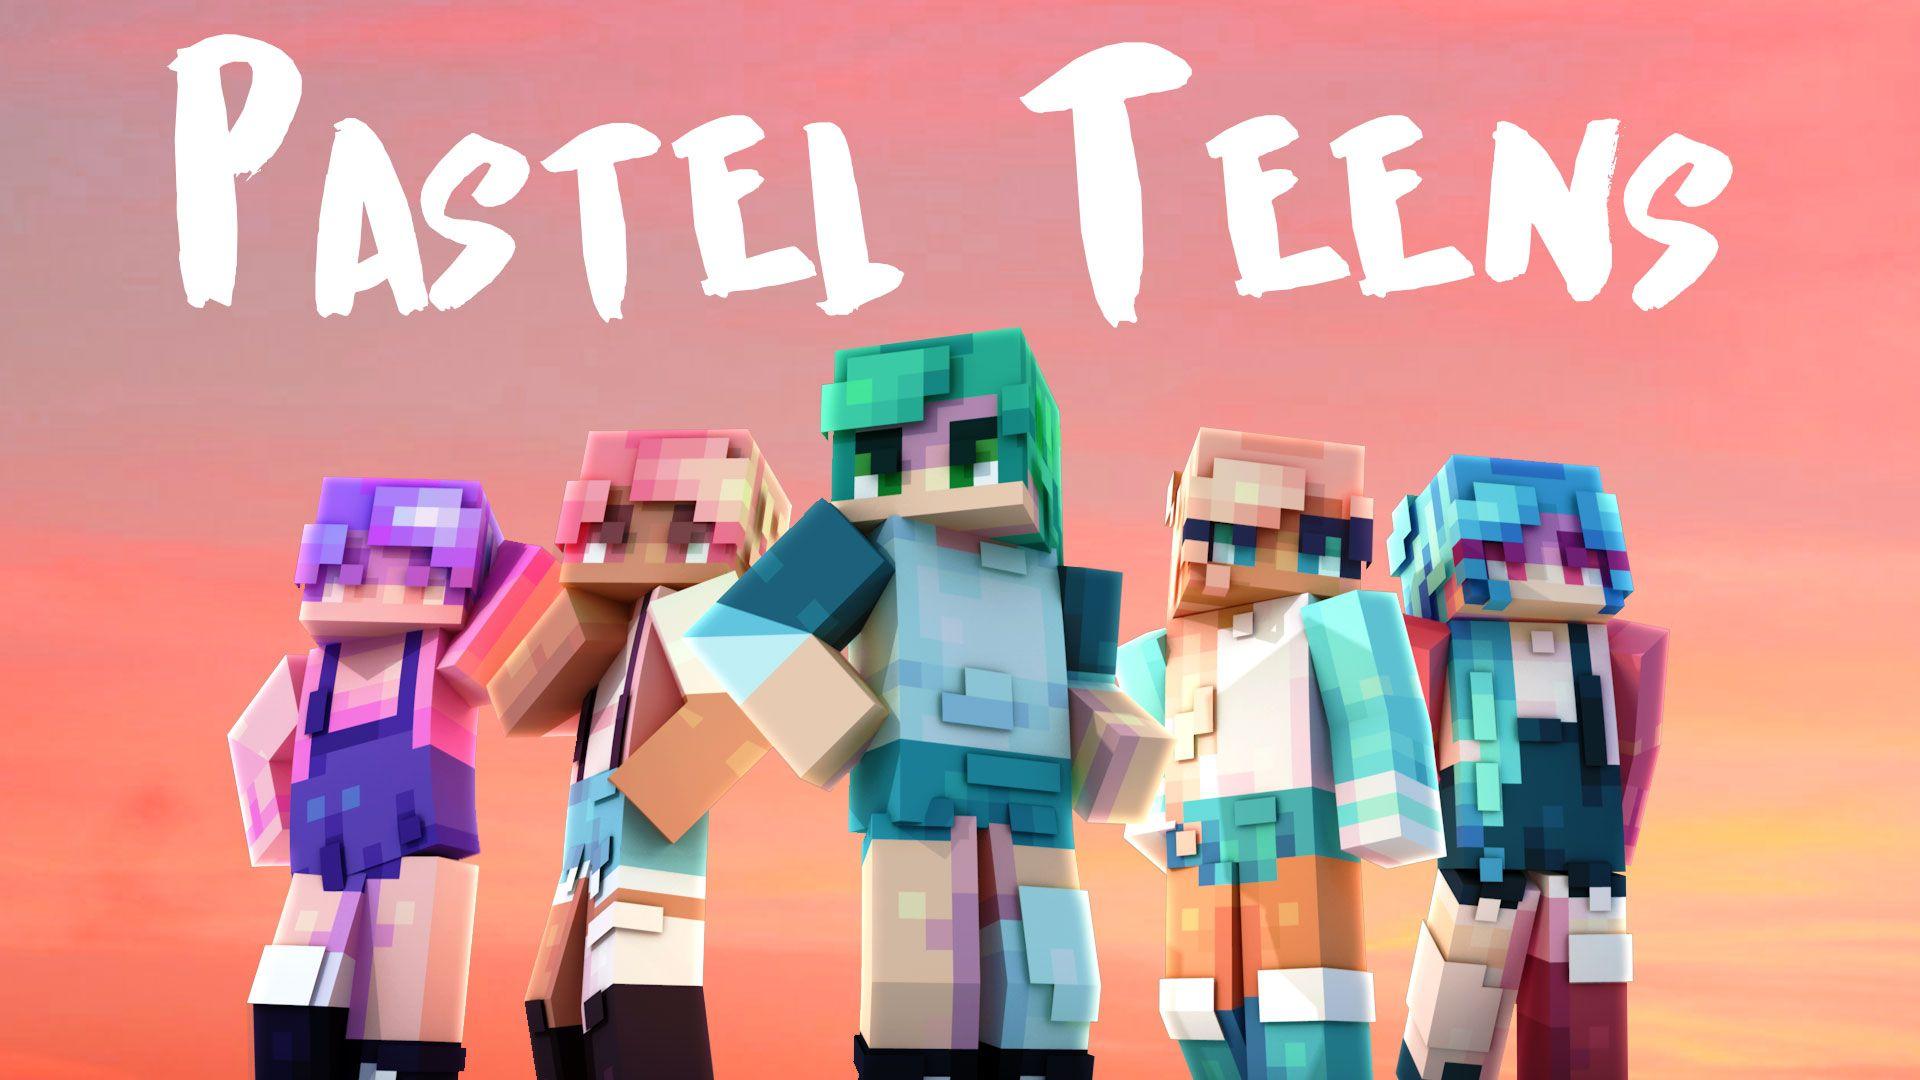 Xbox One Christmas Sweaters Skins Minecraft 2020 Pastel Teens   Minecraft Skin Pack in 2020   Minecraft art